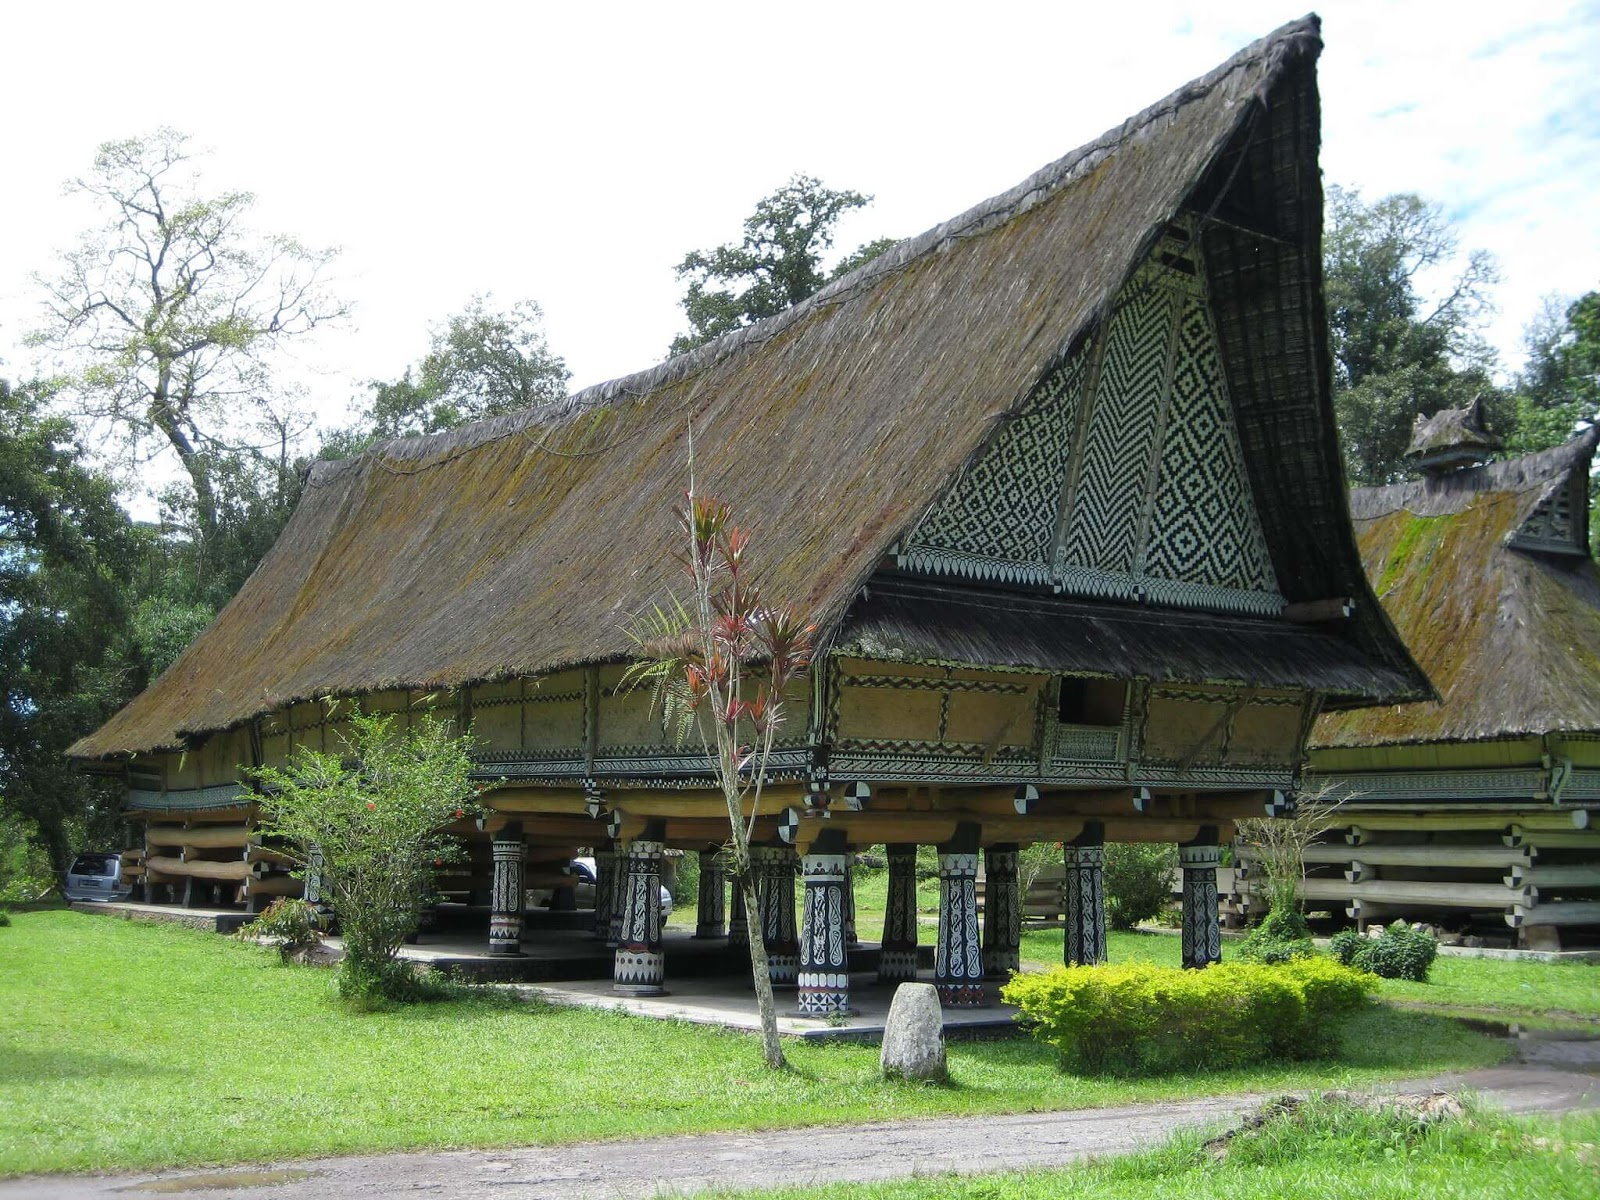 Rumah Bolon Rumah Adat Provinsi Sumatera Utara Parawisata Indonesia Tempat Wisata Indonesia Budaya Indonesia